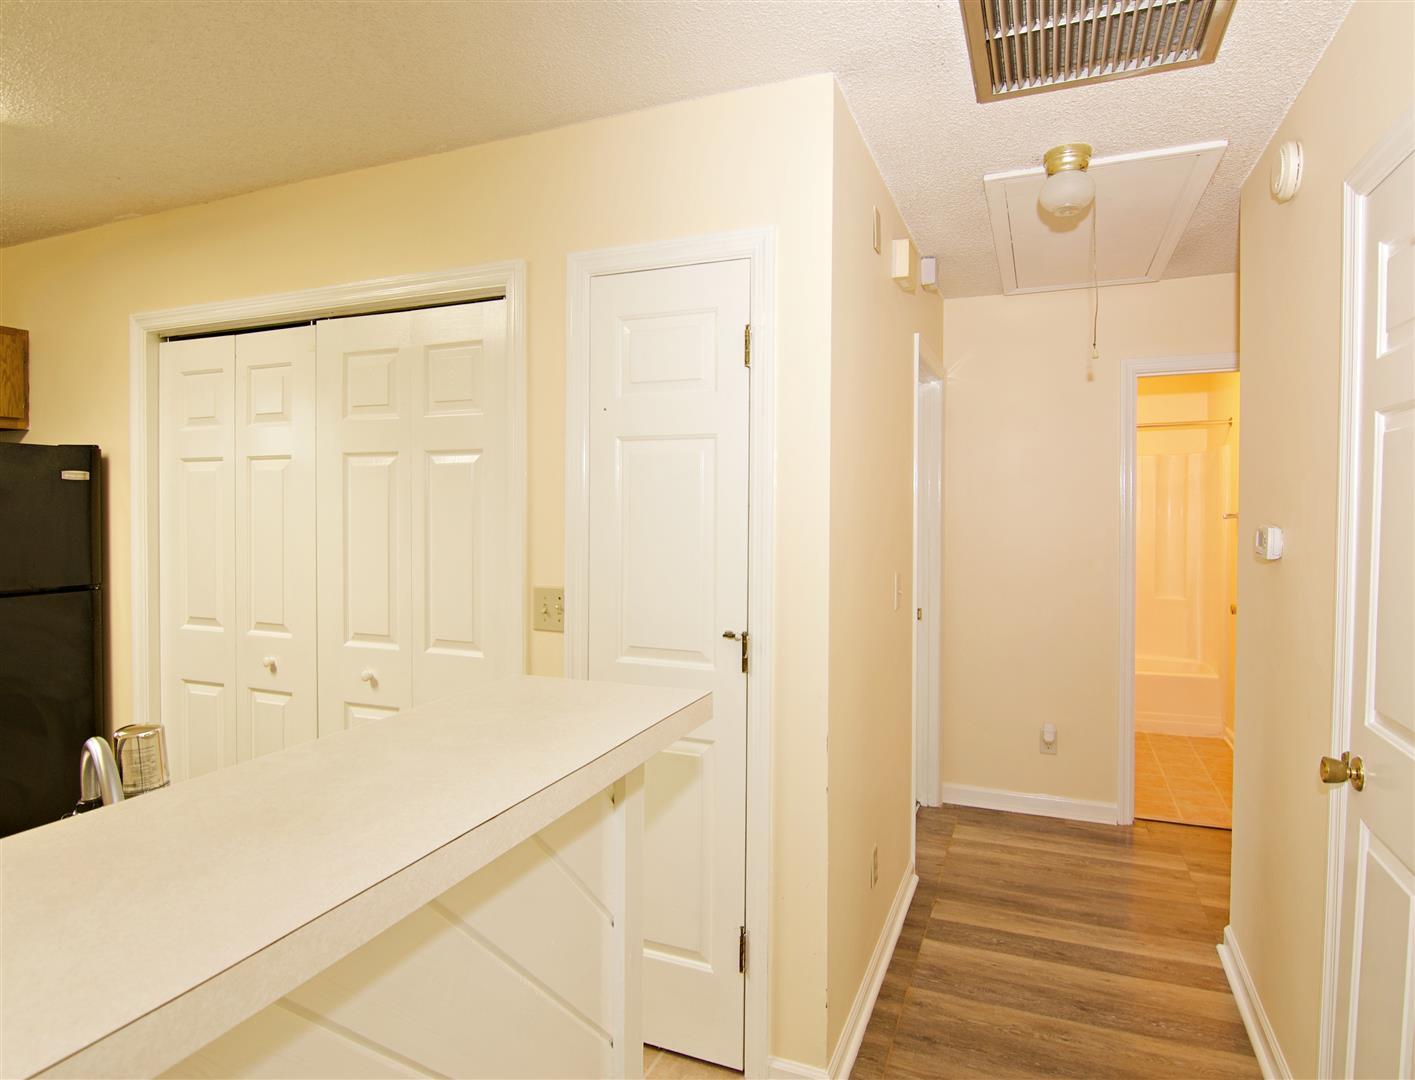 Shaftesbury Woods Homes For Sale - 931 Estates, Charleston, SC - 1